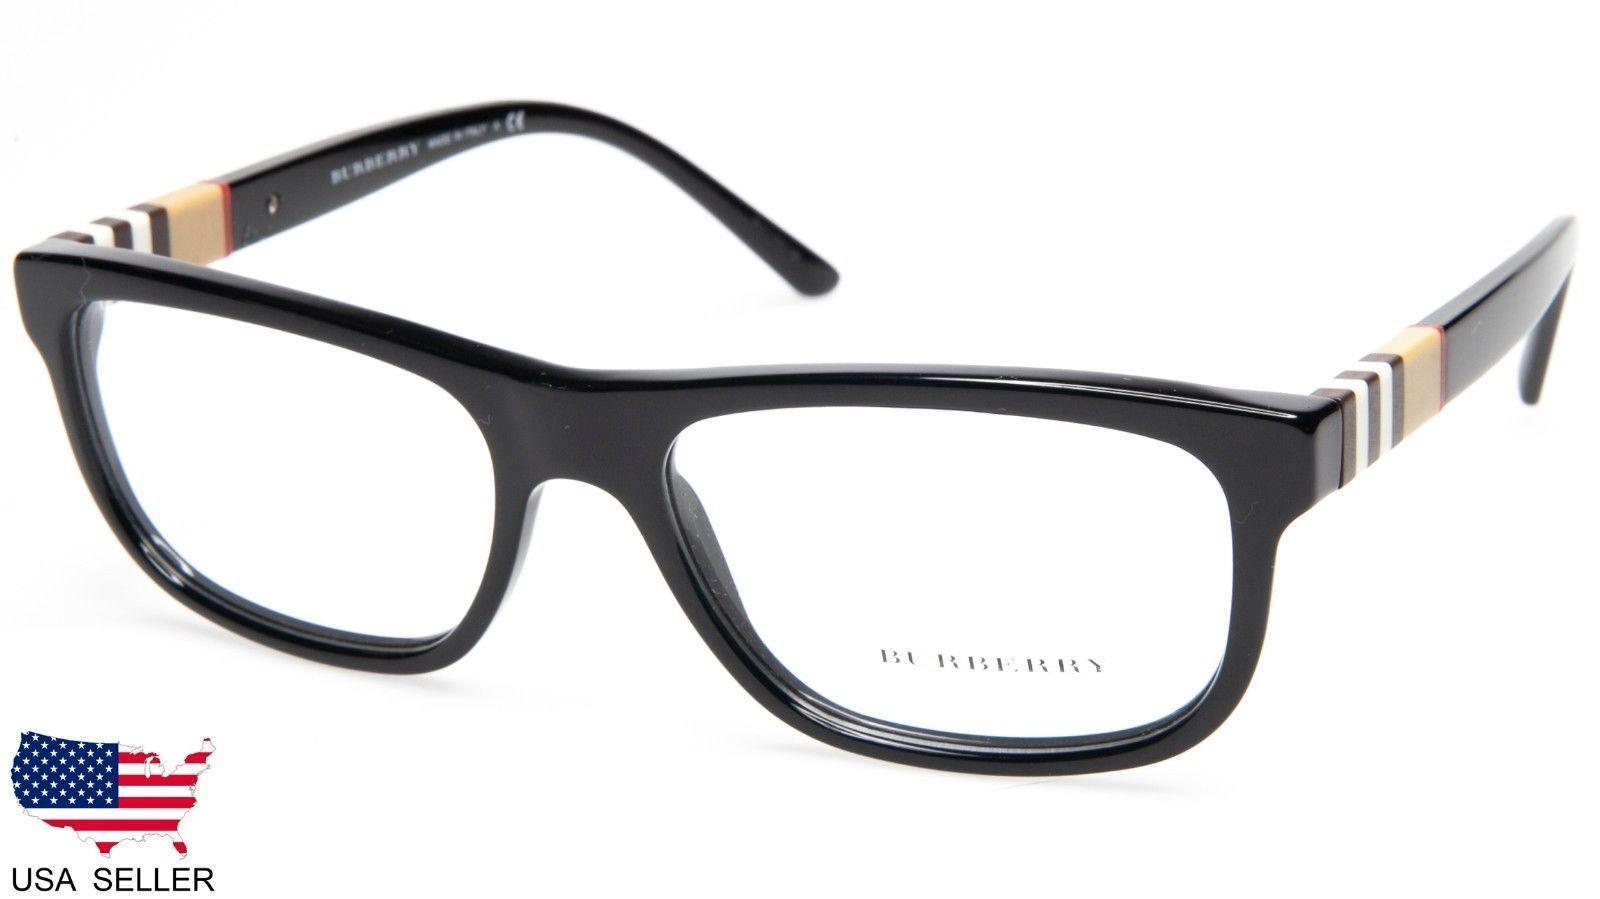 Burberry Eyeglass Frame: 498 listings